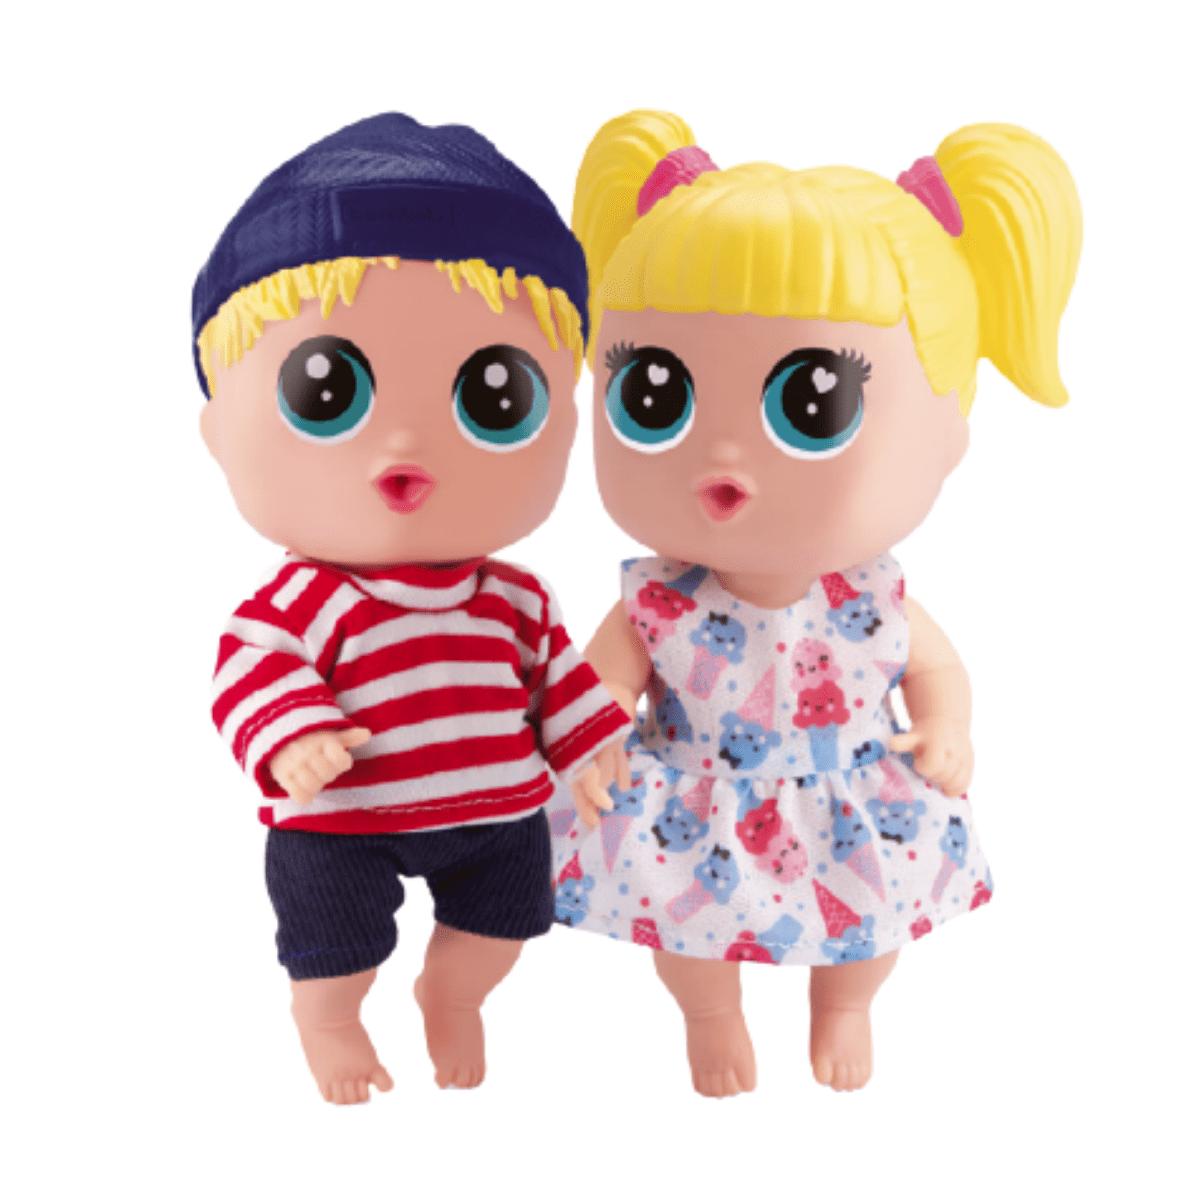 Bonecas Baby Buddies Gêmeos - Bambola